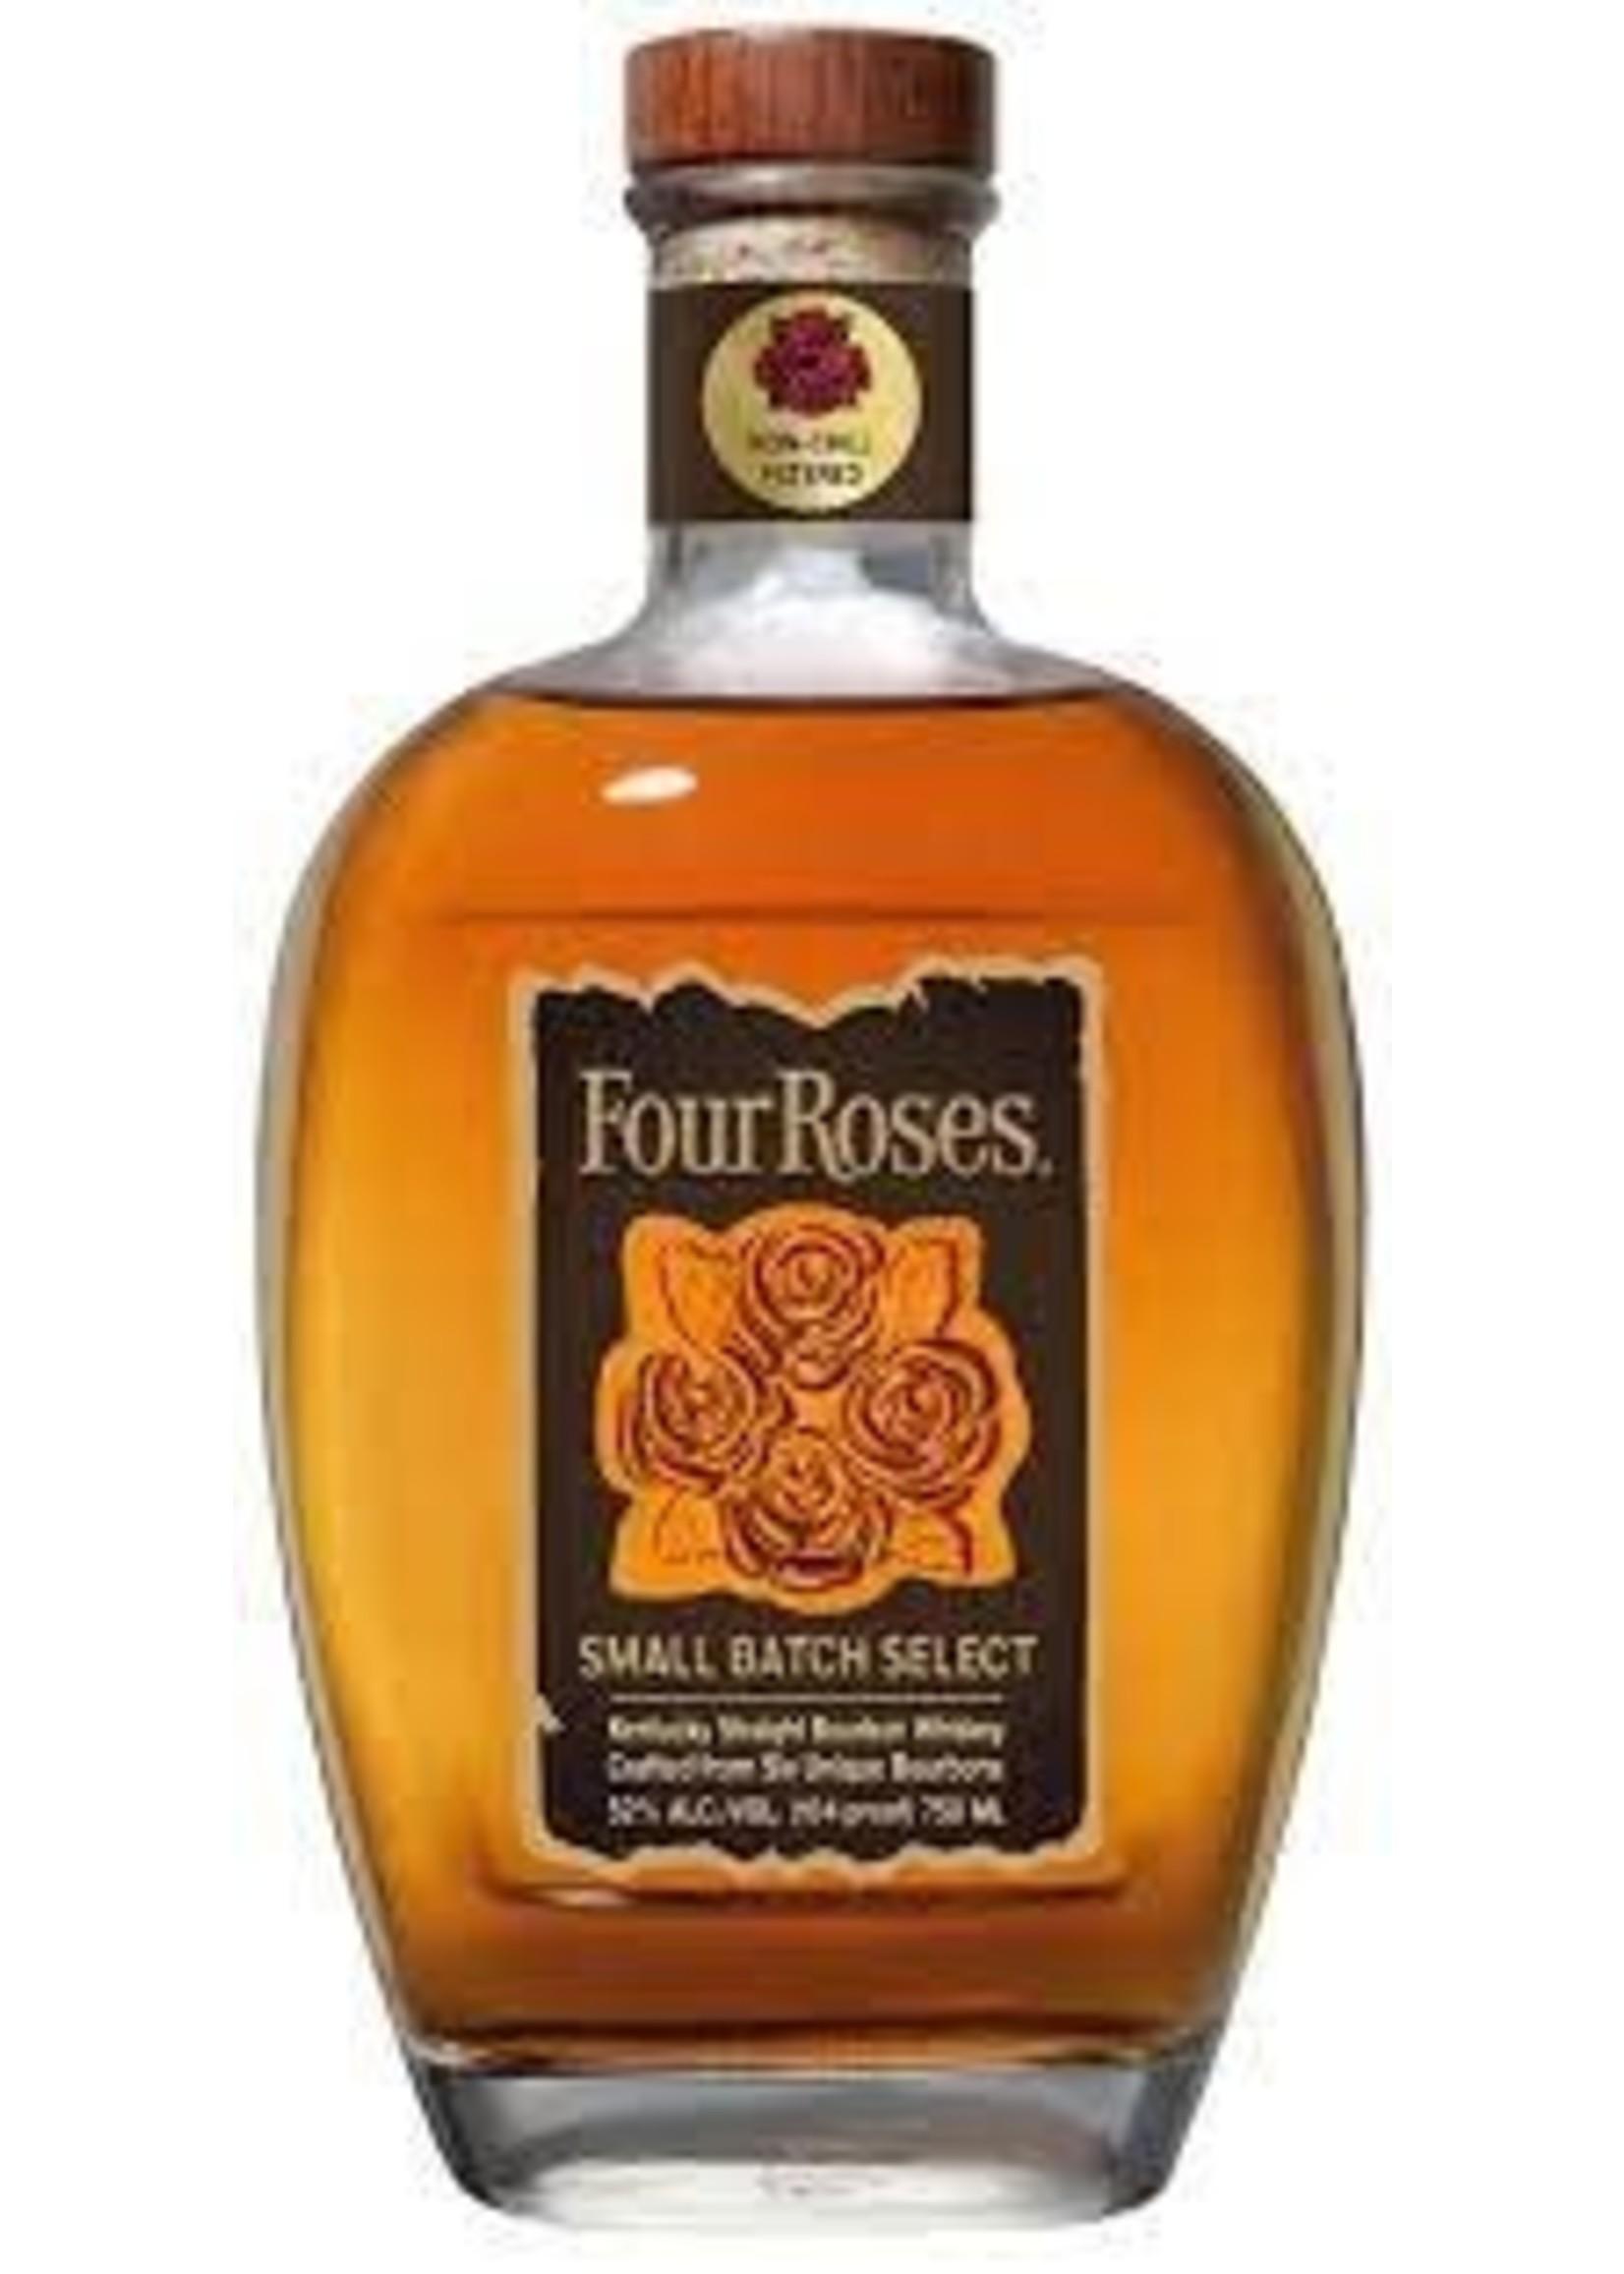 Four Roses Bourbon Small Batch Select 104PF 750ml